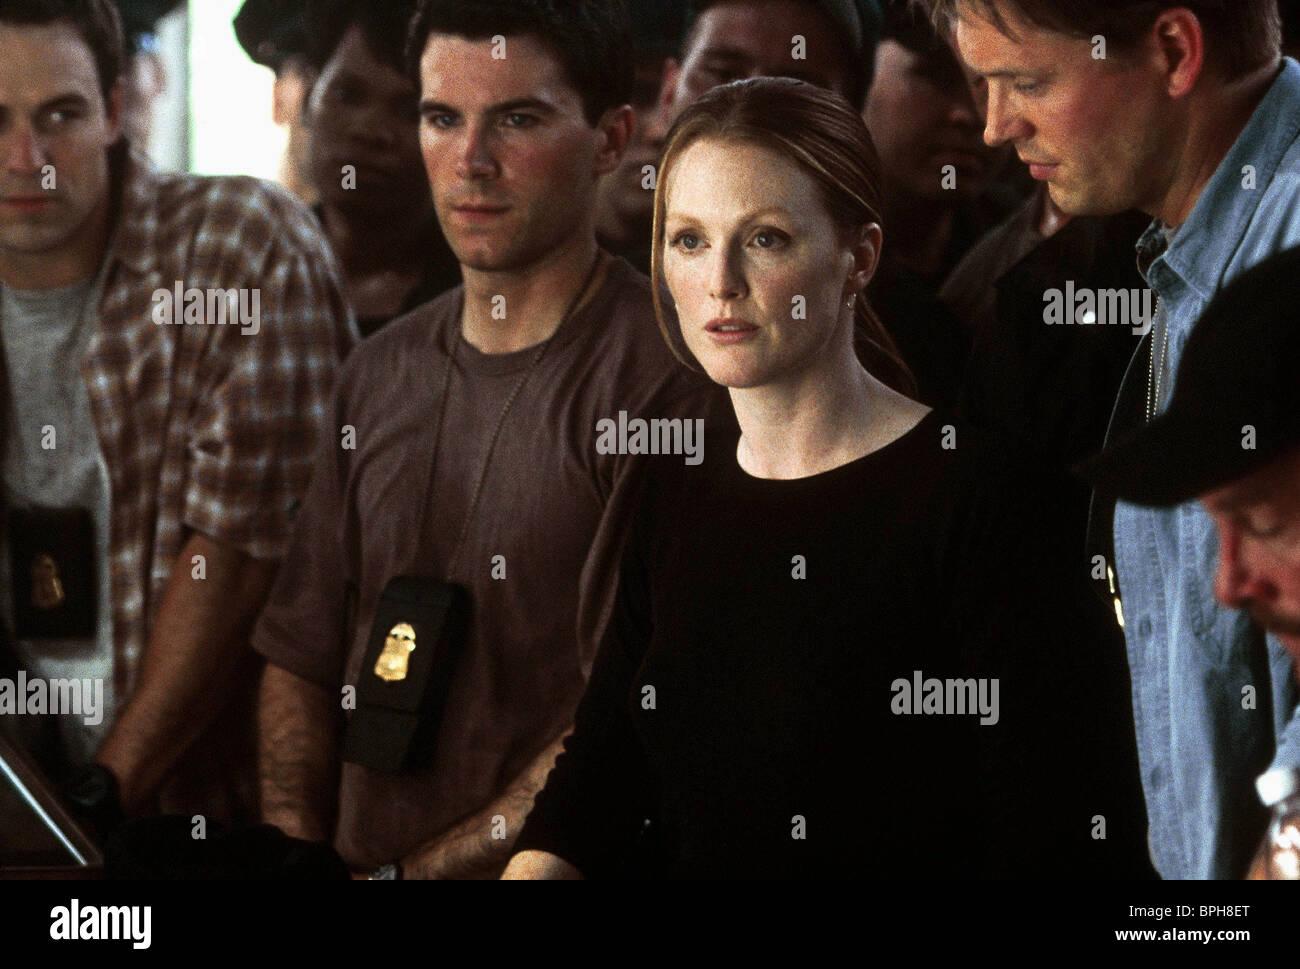 JULIANNE MOORE HANNIBAL (2001) - Stock Image